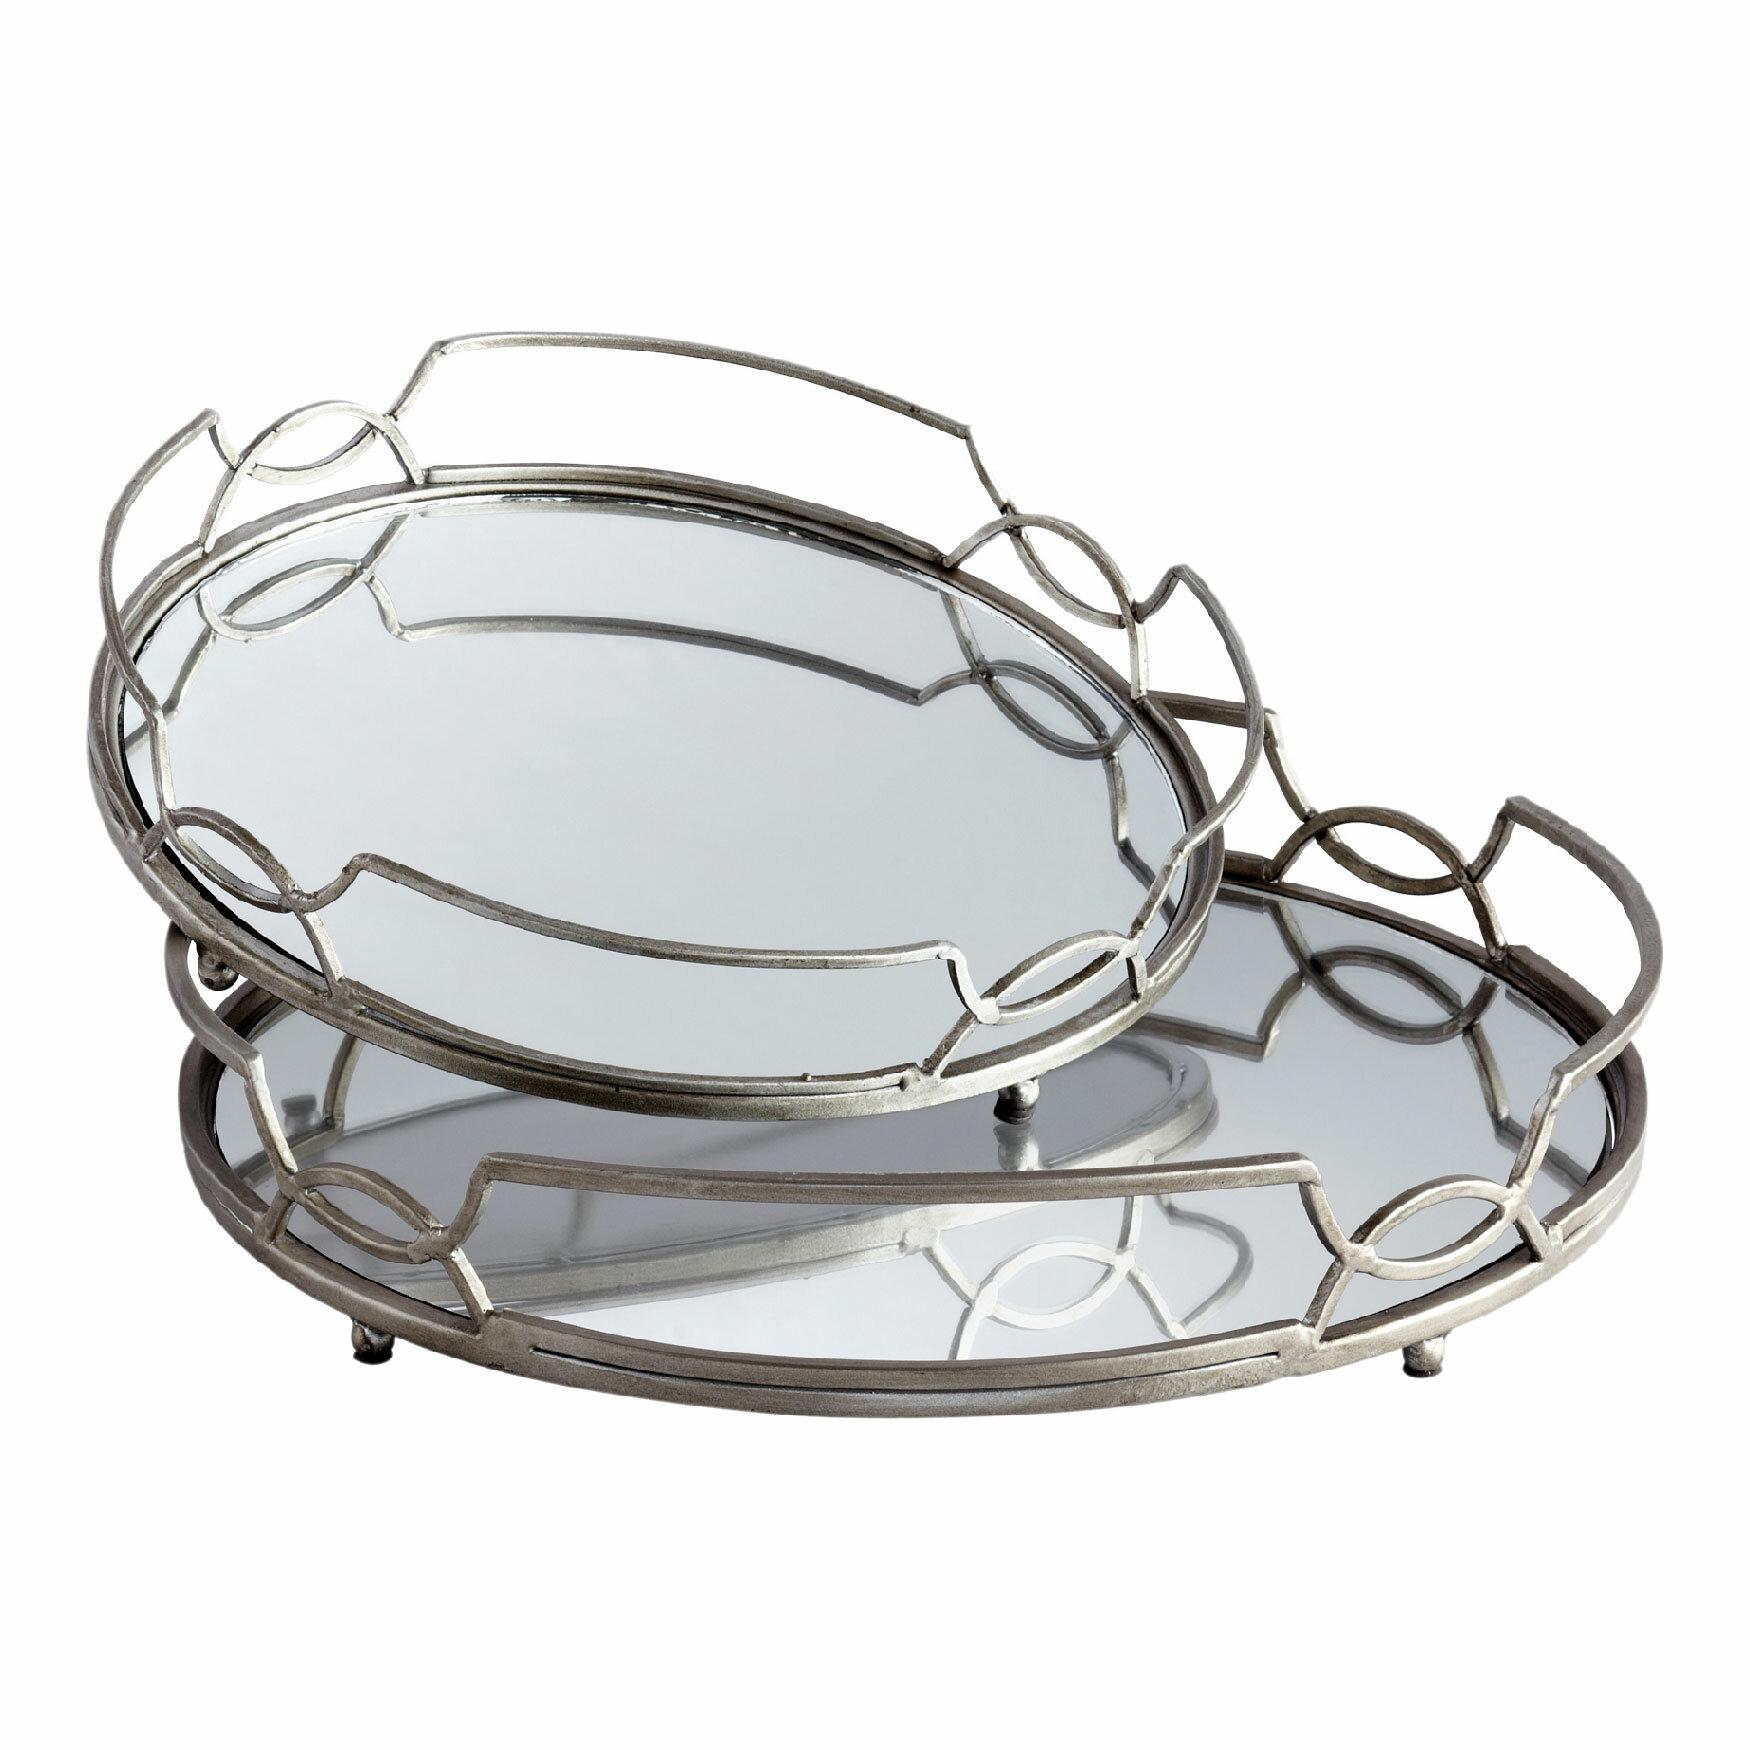 Willa Arlo Interiors Rosenblatt Round Mirrored 2 Piece Vanity Tray Set Reviews Wayfair Ca